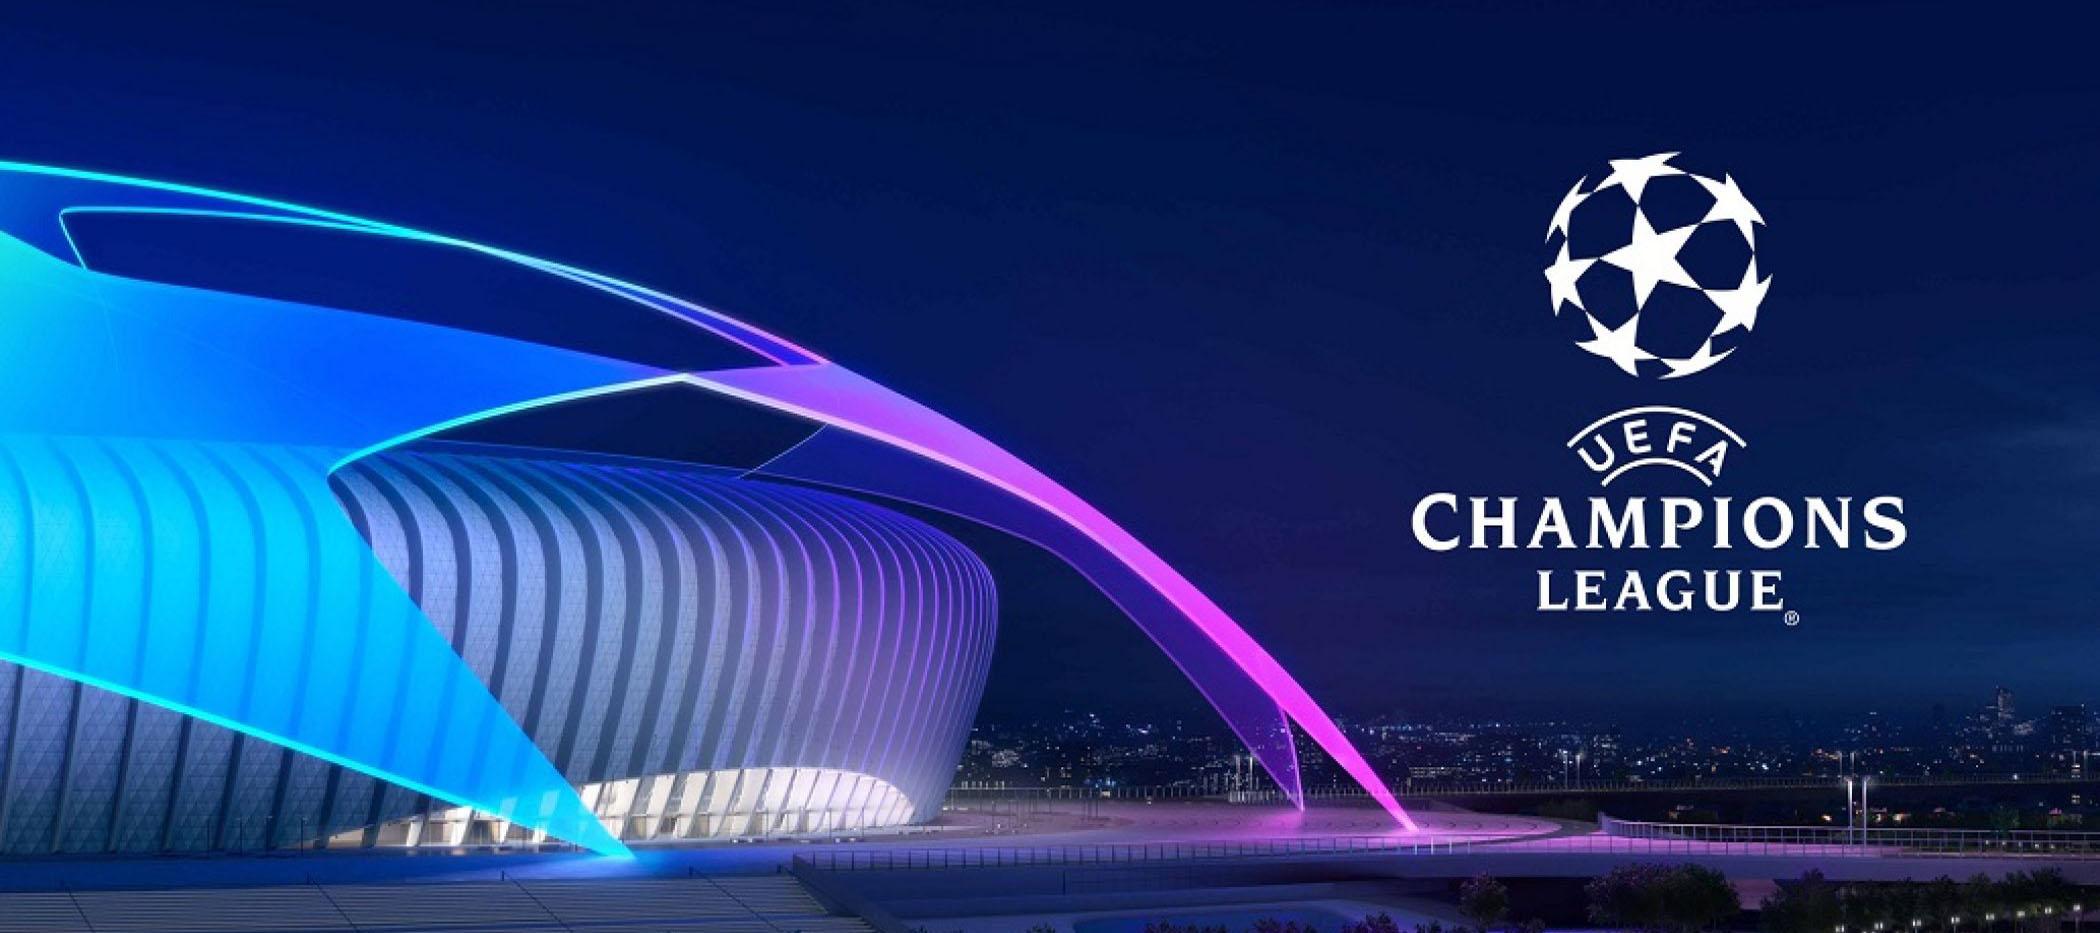 UEFA Champions League 2020 Update